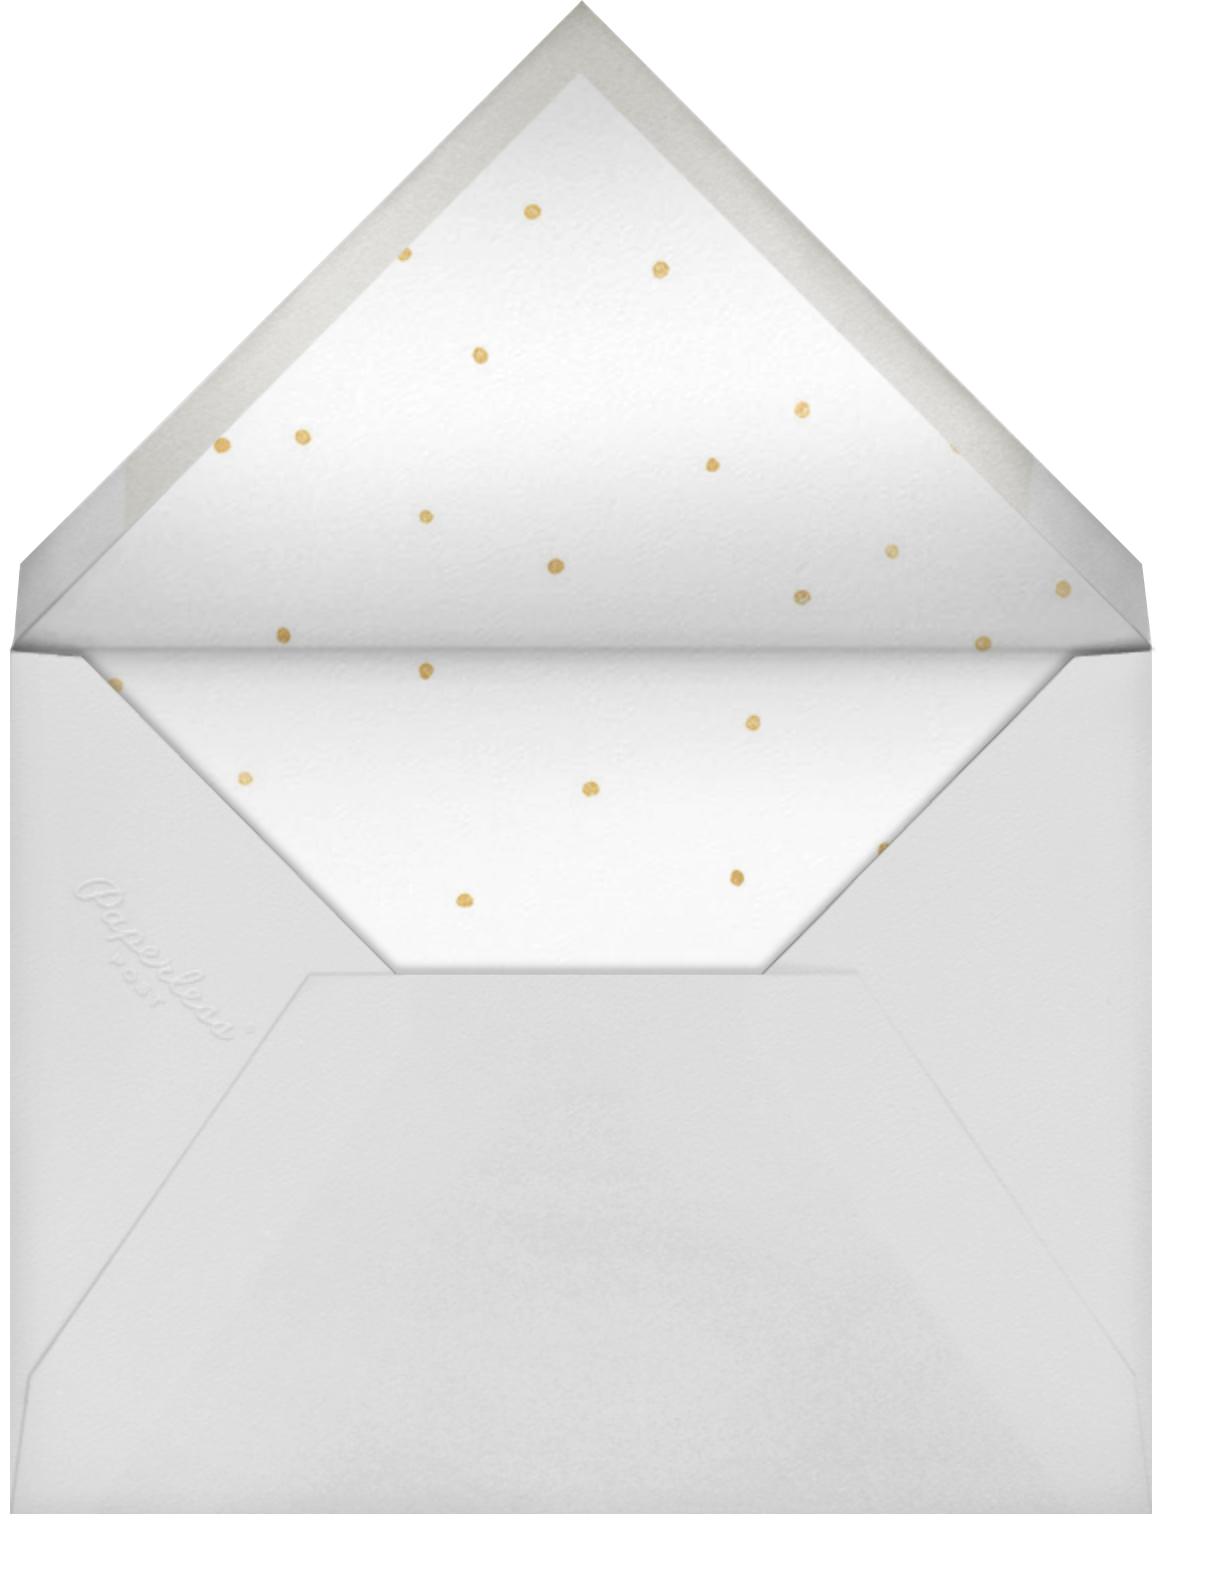 Loving Stars - Sugar Paper - Bat and bar mitzvah - envelope back